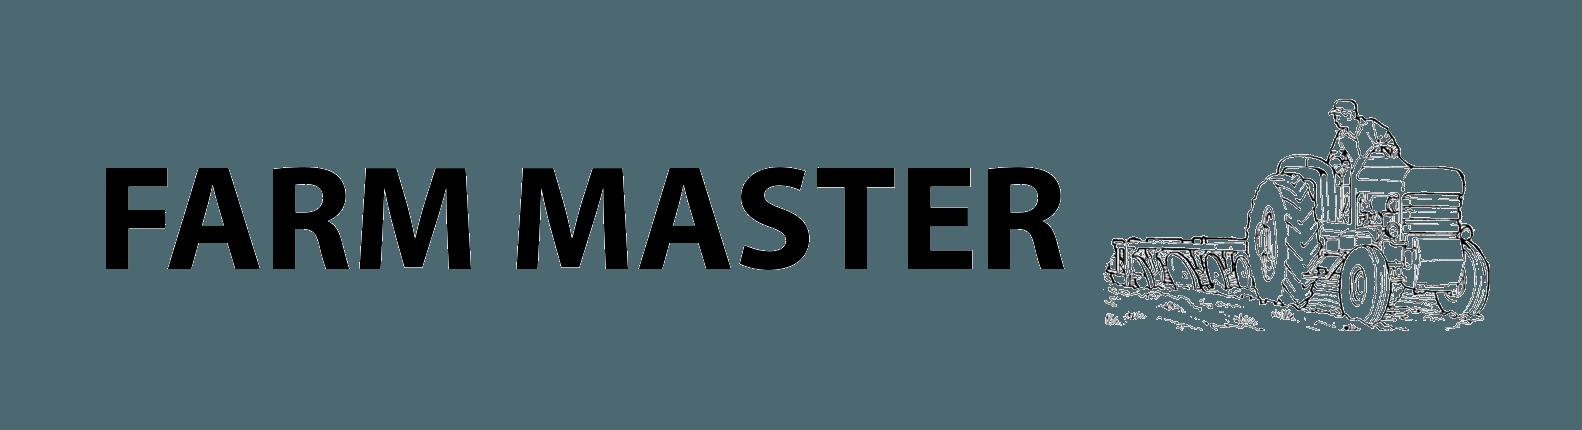 Farm Master